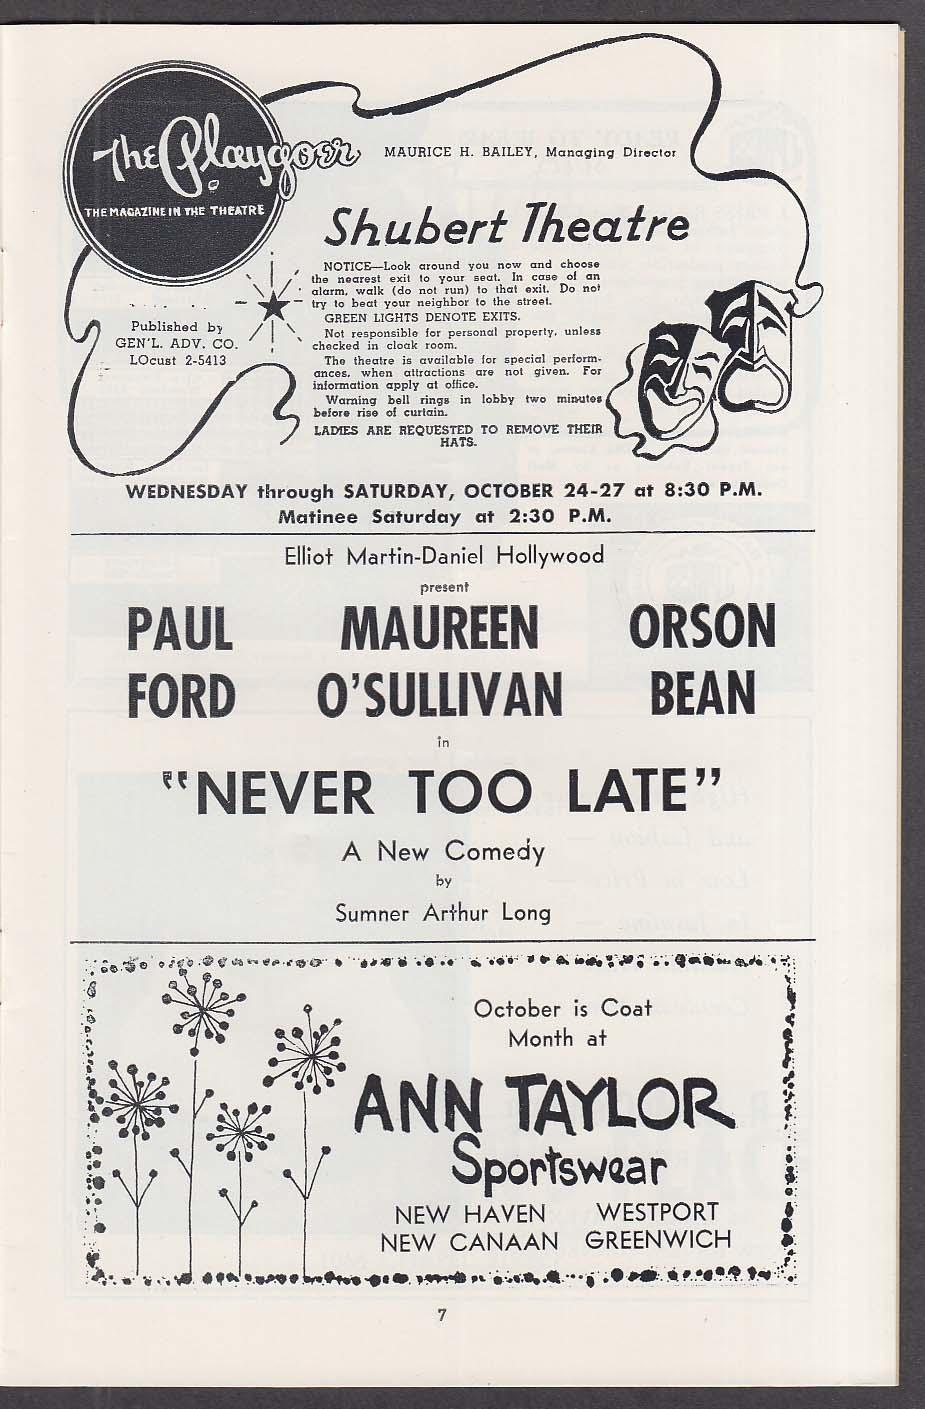 Never Too Late World Premiere Shubert Theatre program 1962